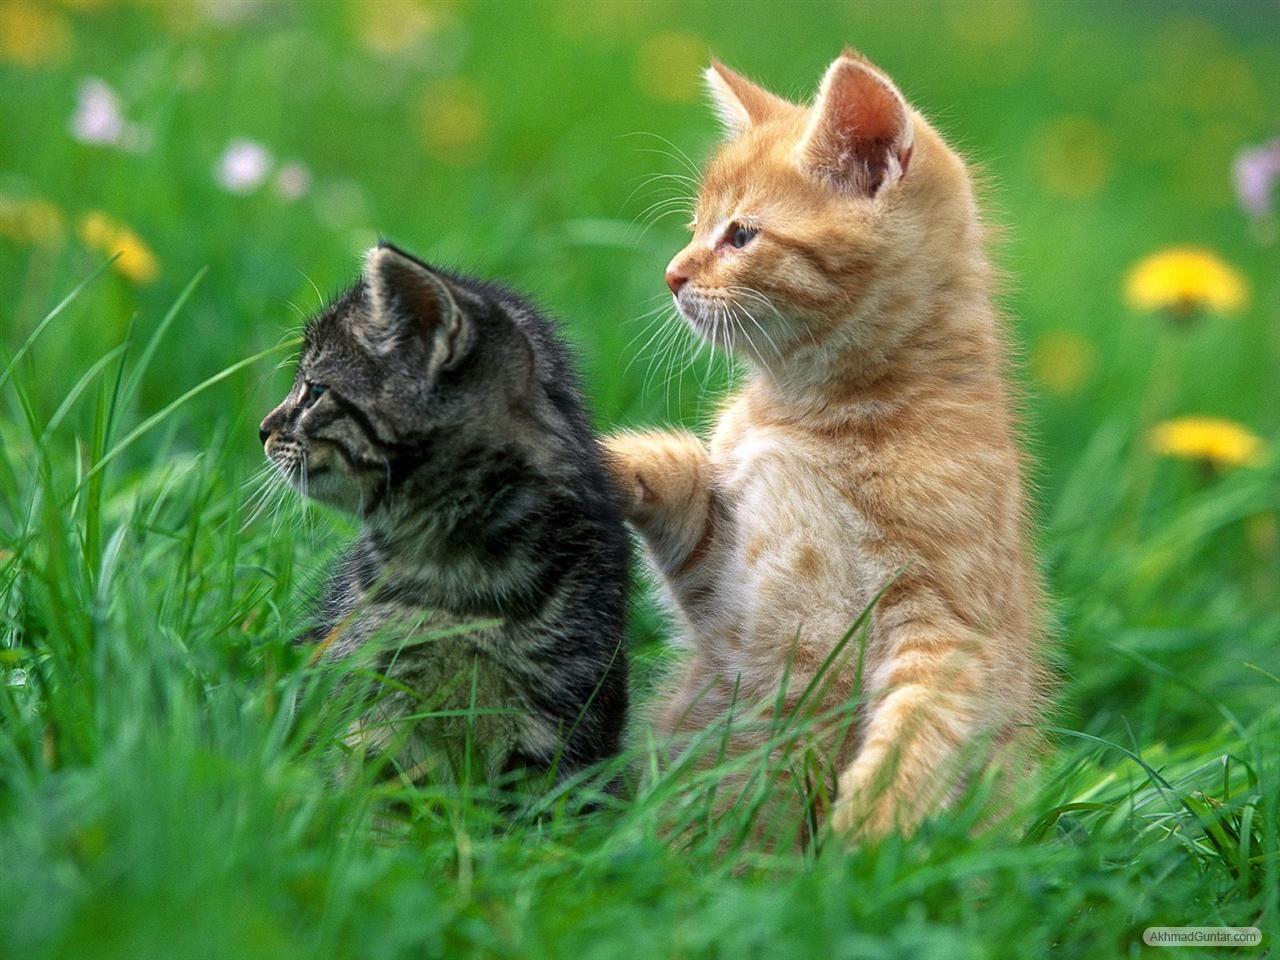 Kucing Imut Wallpaper